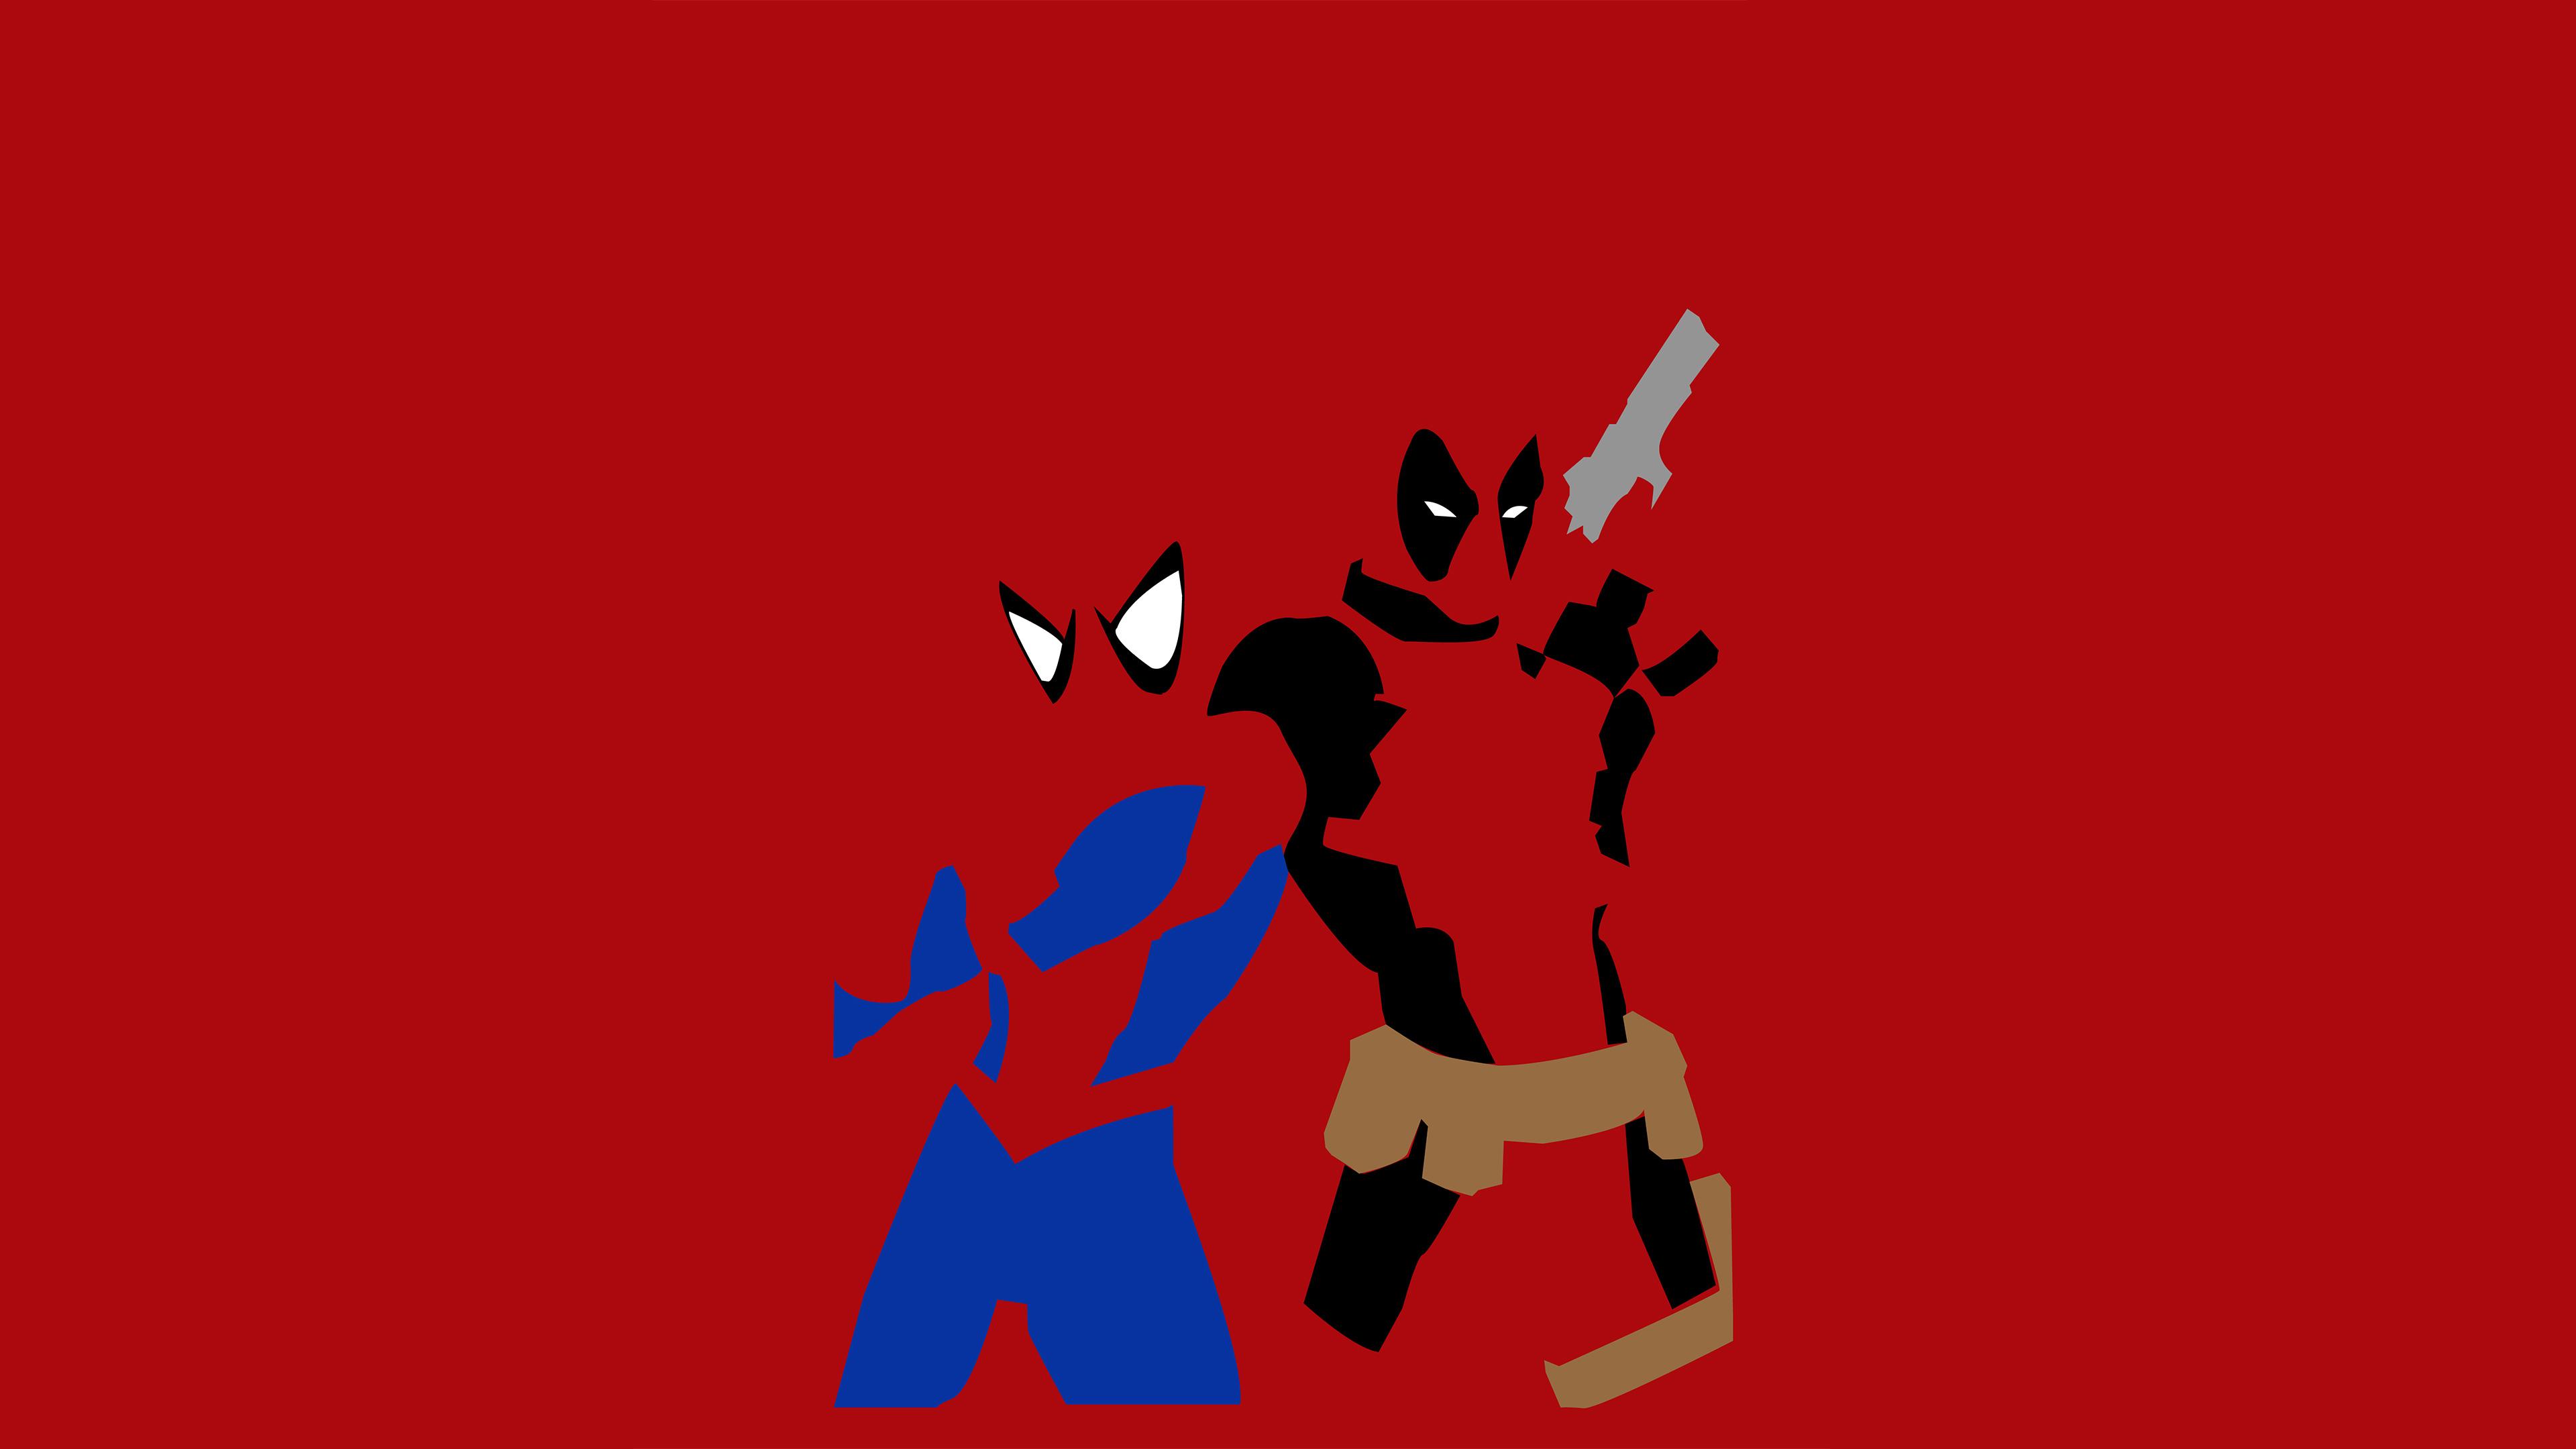 Wallpaper 4k Spiderman And Deadpool Minimalism 4k Wallpapers